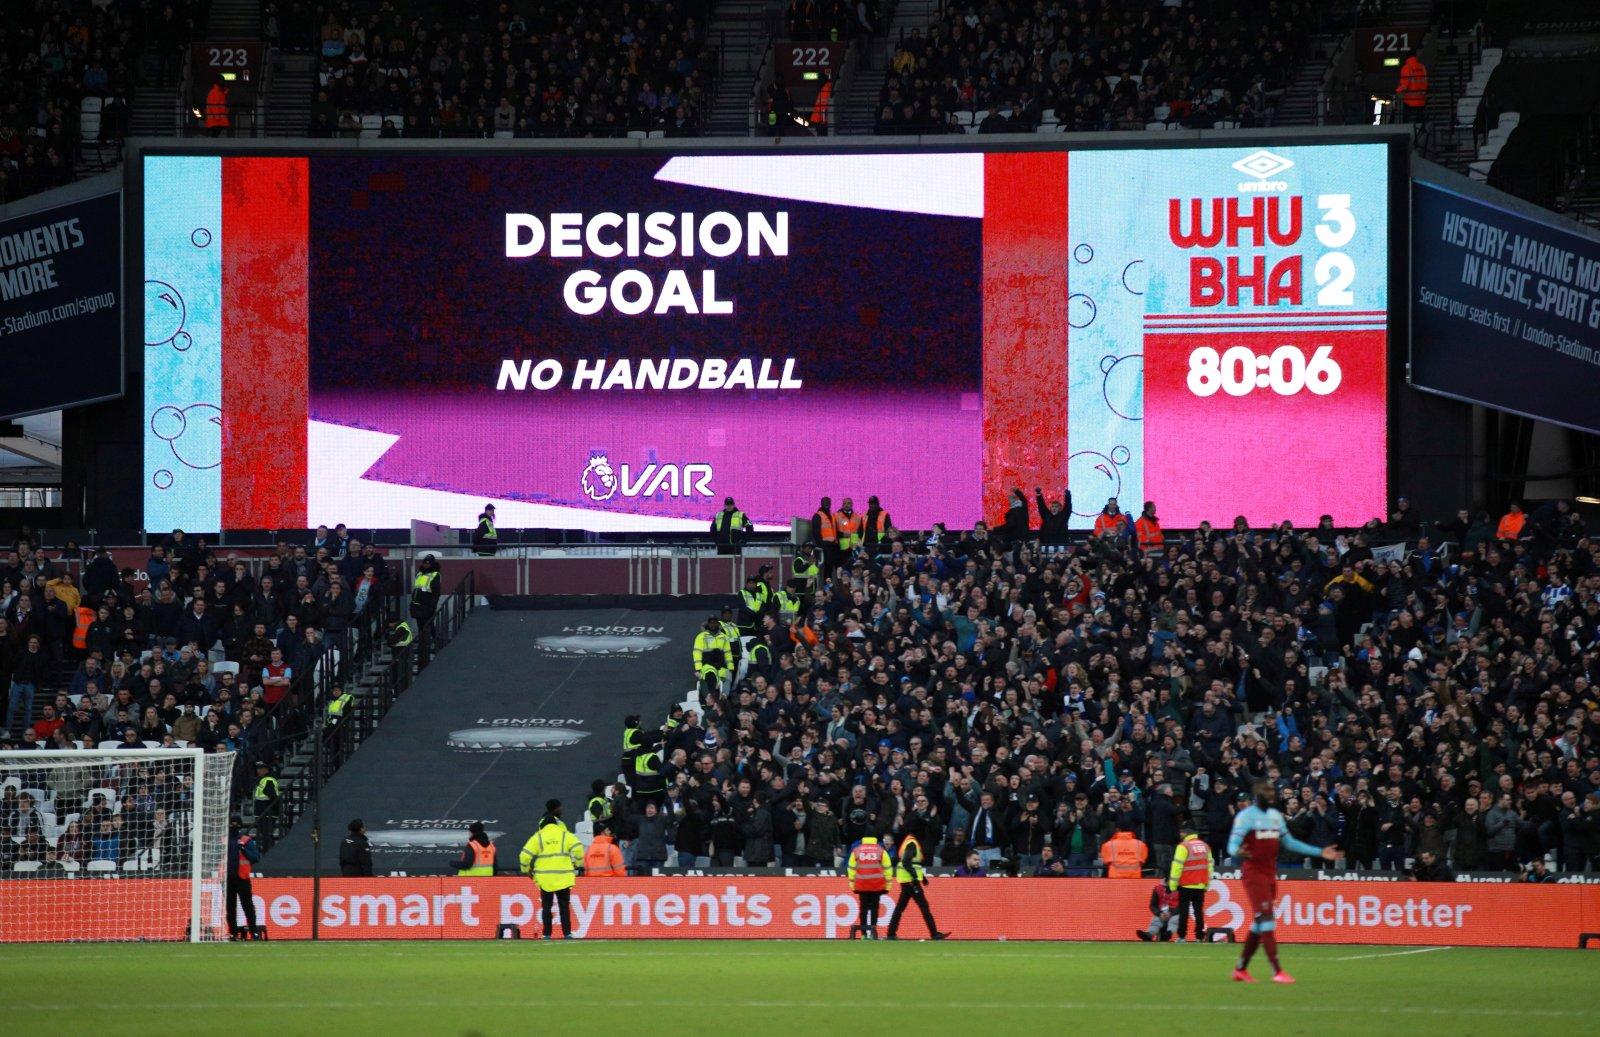 Image for West Ham fans on social media think Premier League VAR table is typical